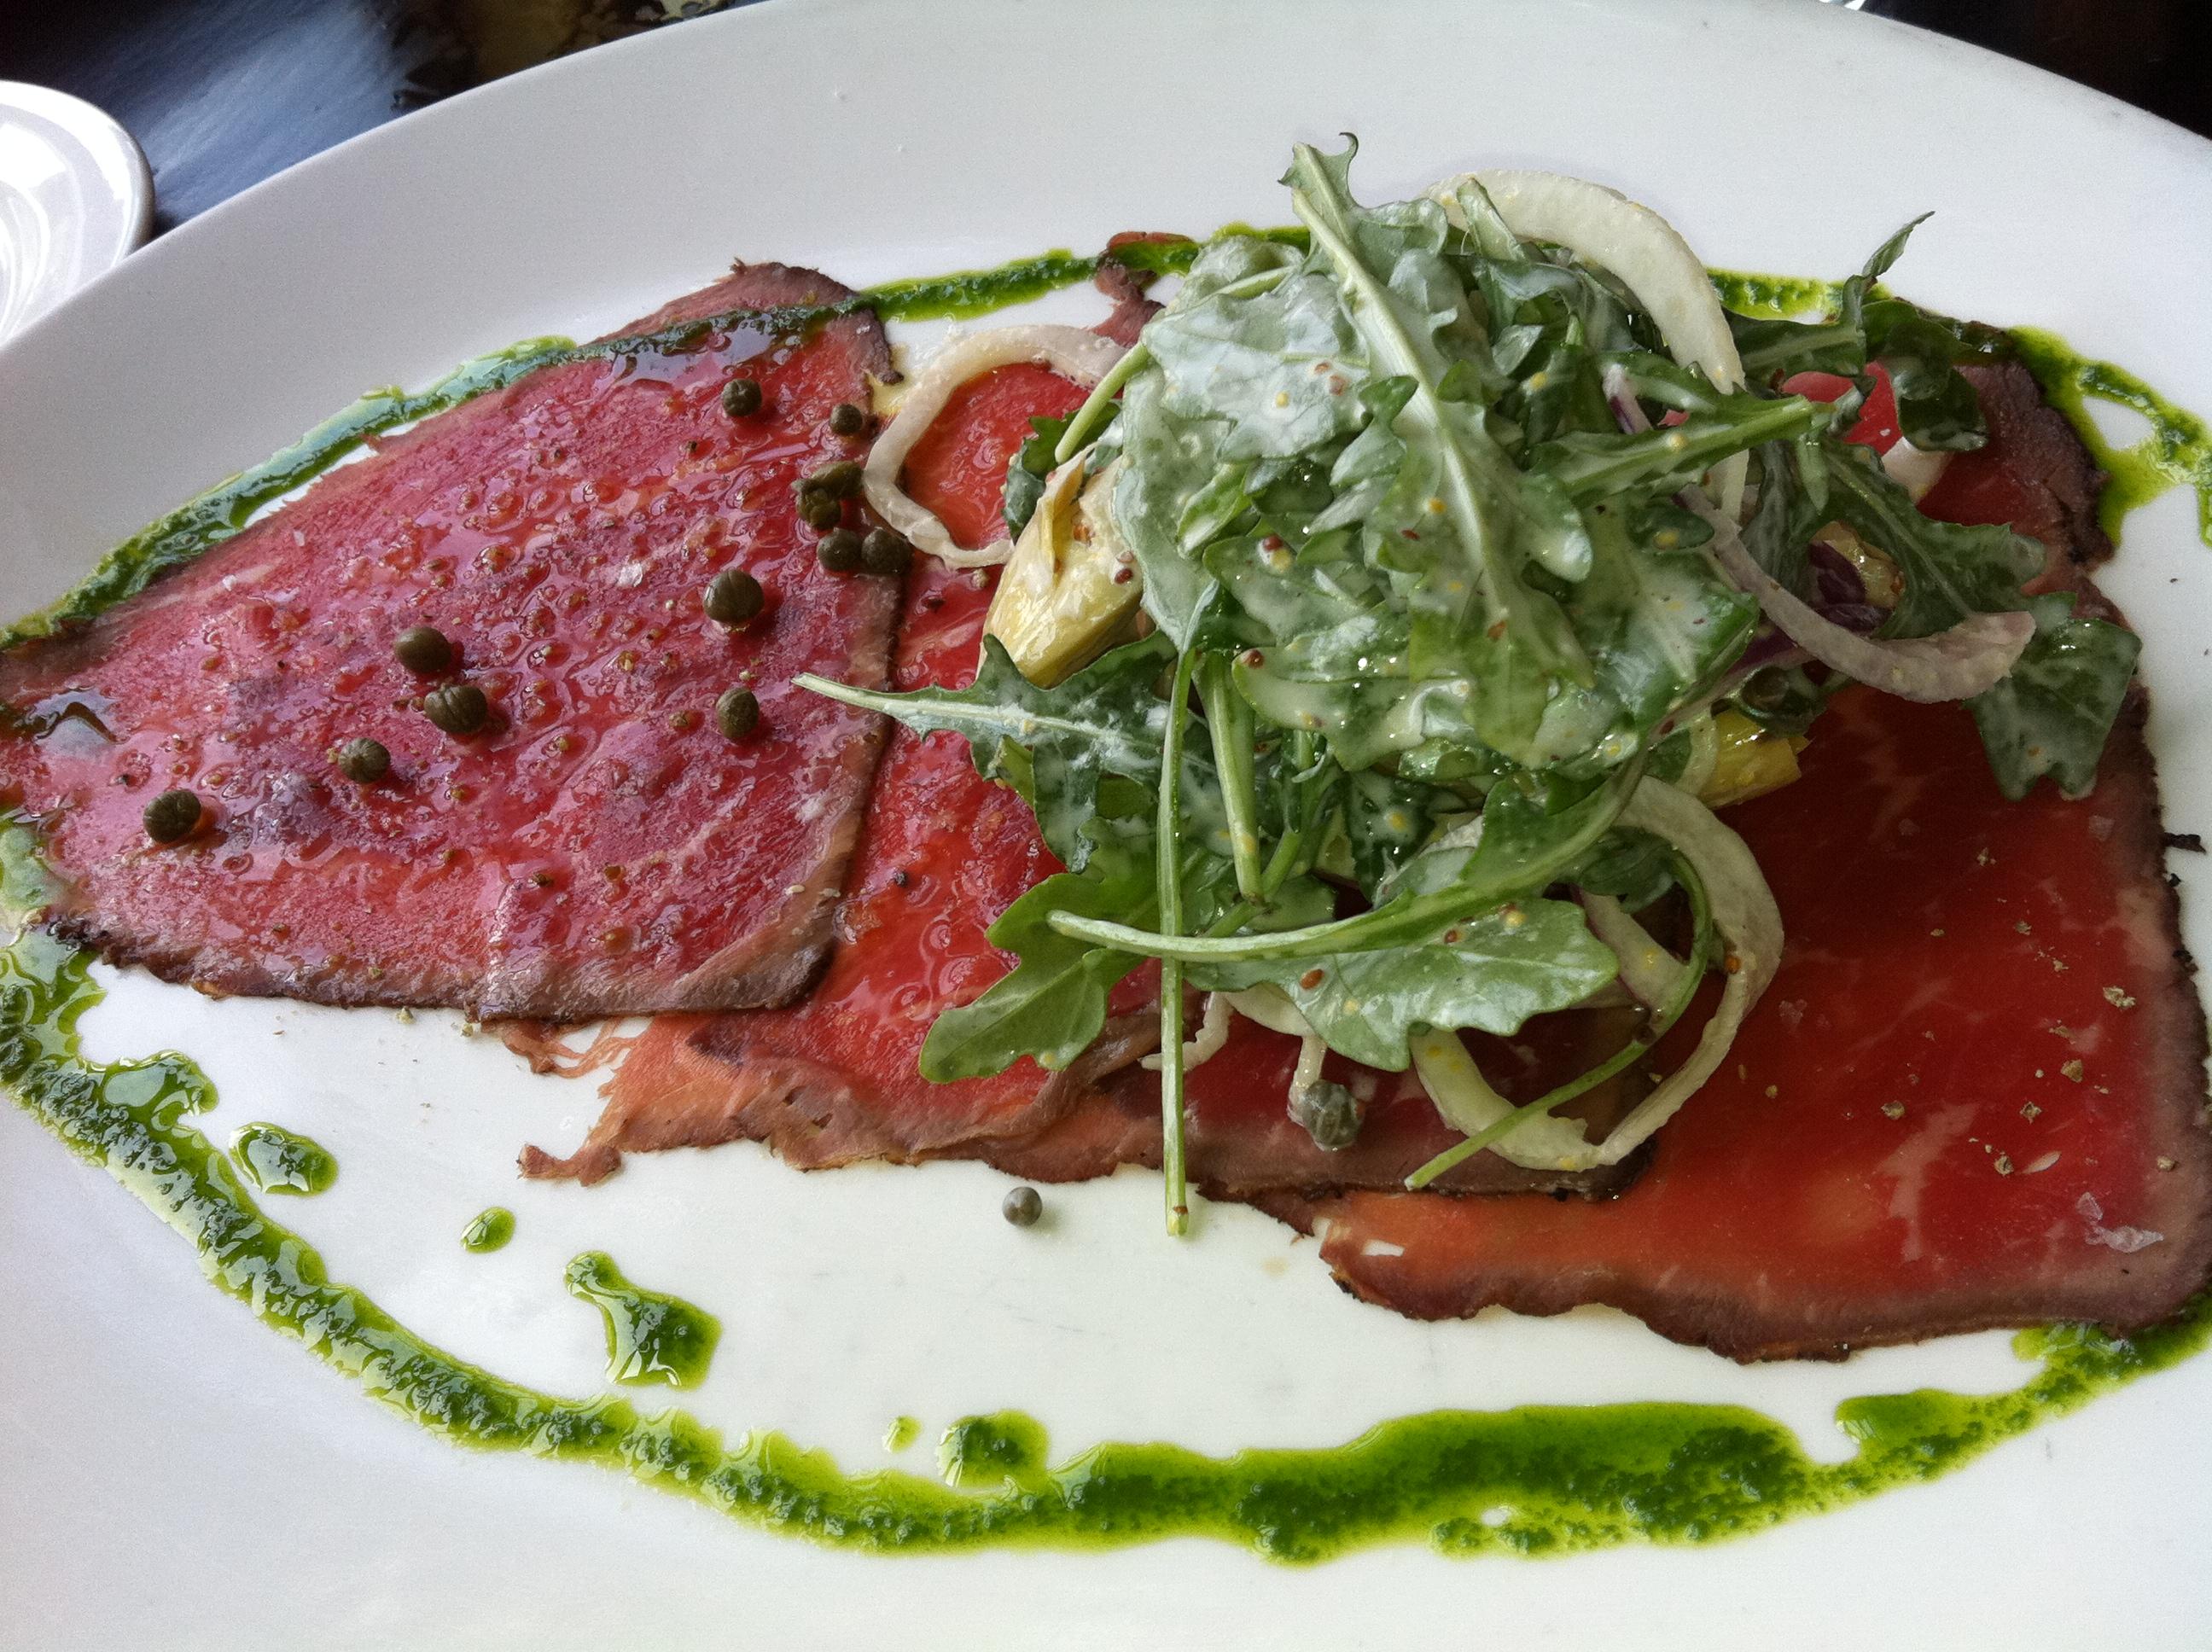 Beef carpaccio | Matt on Not-WordPress